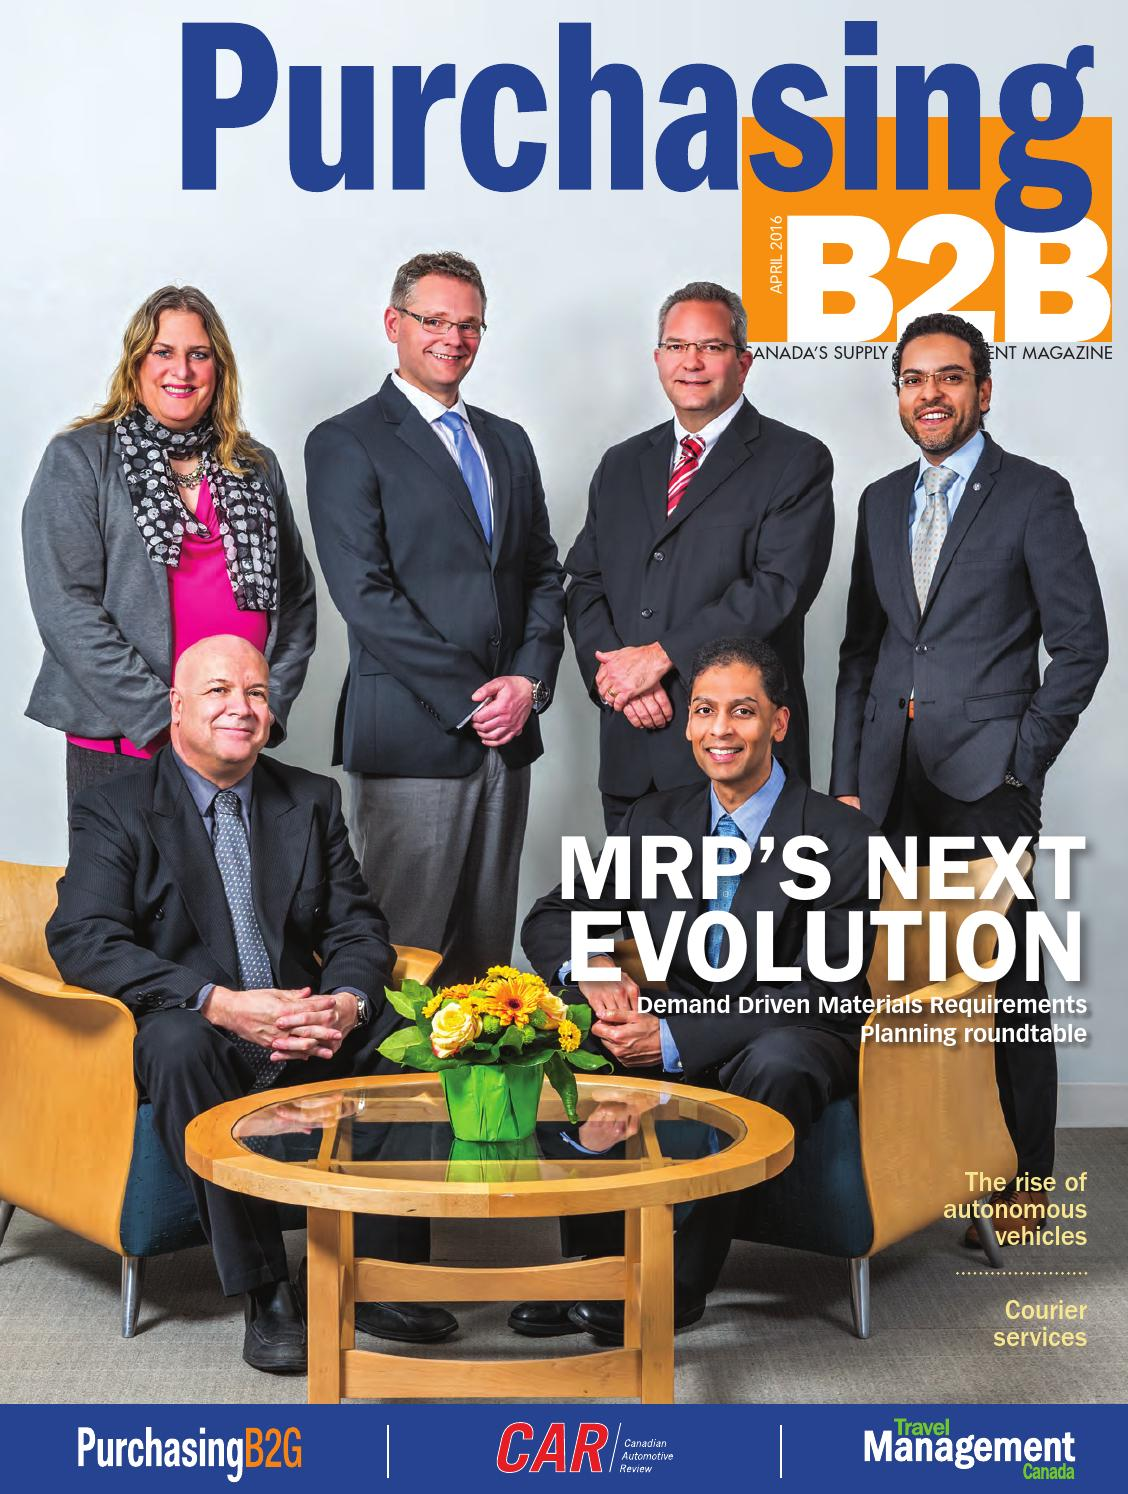 Purchasing B2B April 2016 by Annex Business Media - issuu